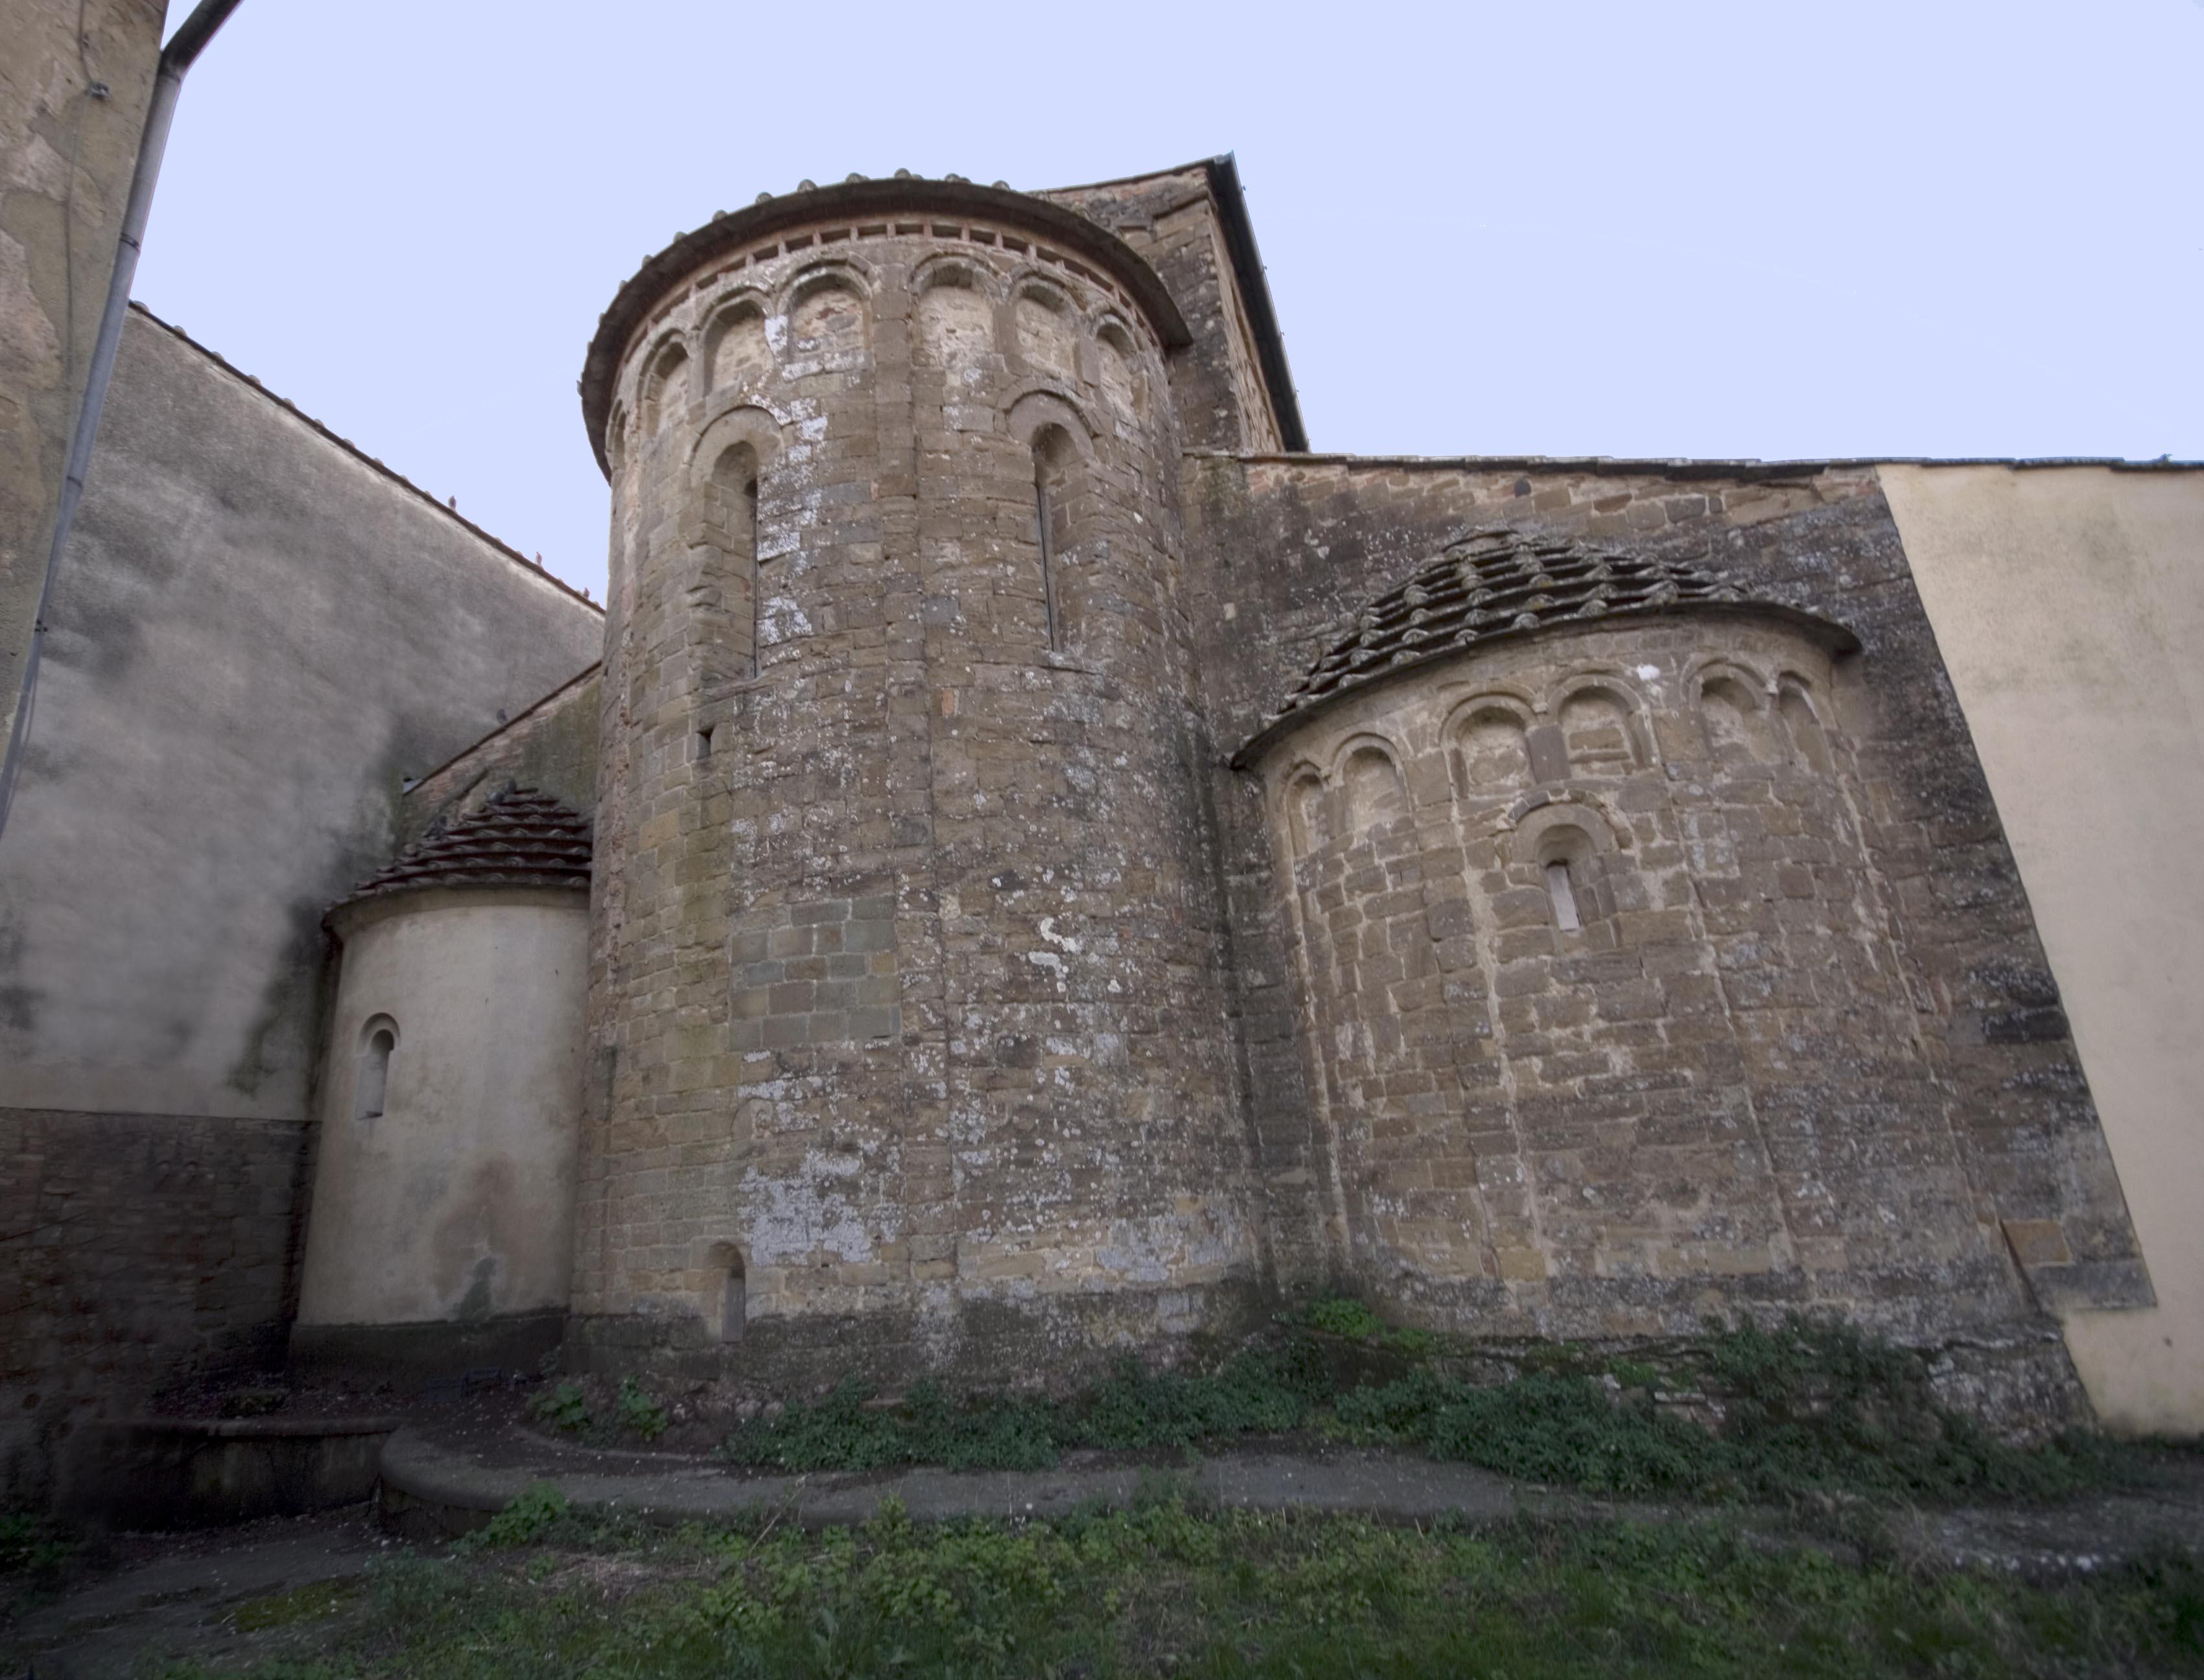 Pieve di san lazzaro abside.jpg